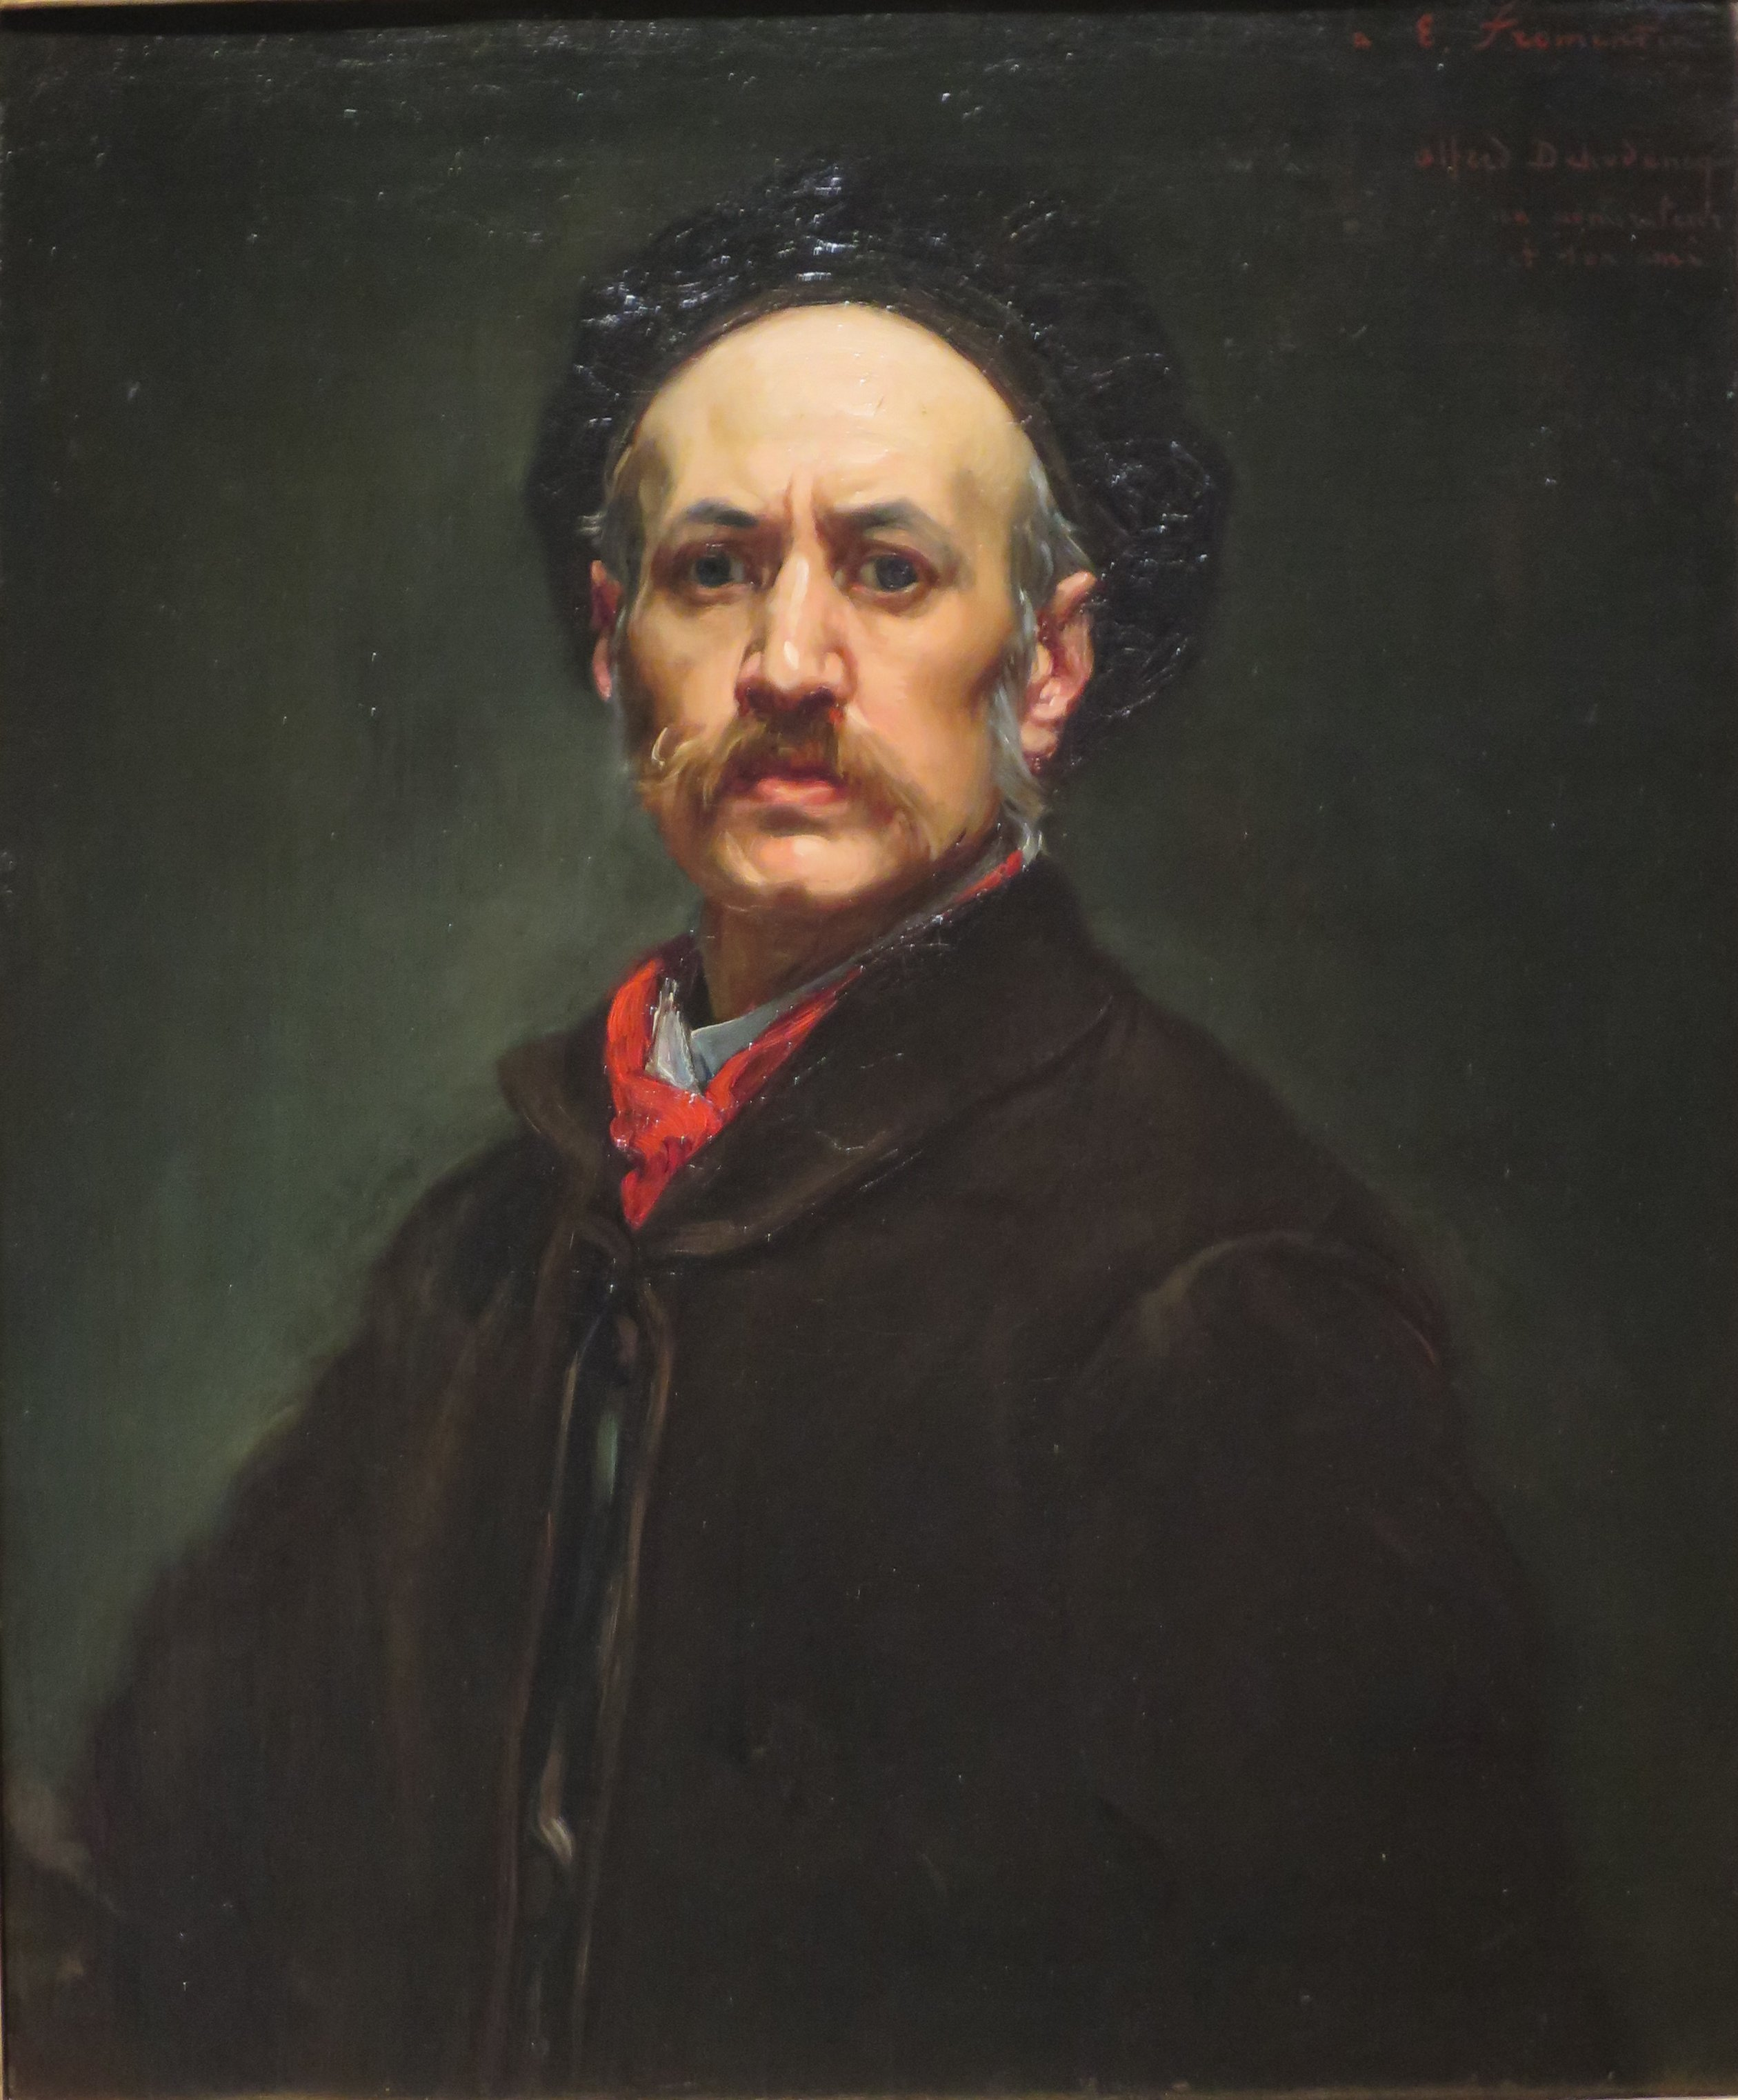 Figure 8. Alfred Dehodencq, Self Portrait, 1870, oil on canvas, High Museum of Art, Atlanta.